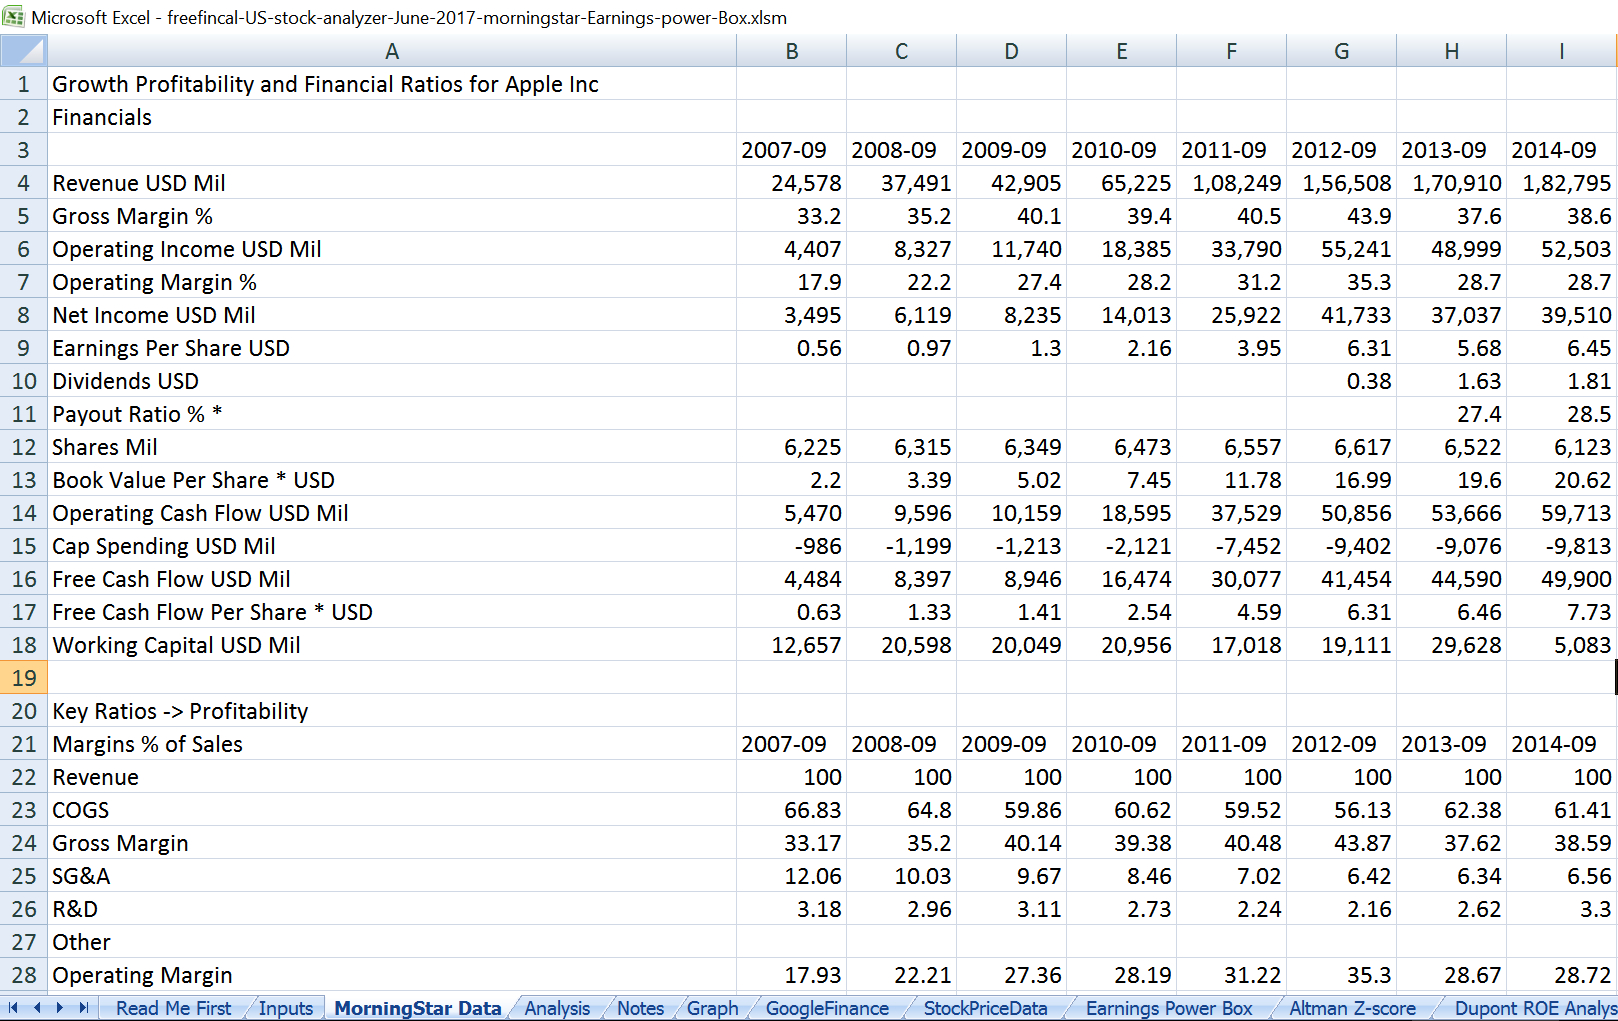 Stock Spreadsheet With Regard To Stock Analysis Spreadsheet For U.s. Stocks: Free Download